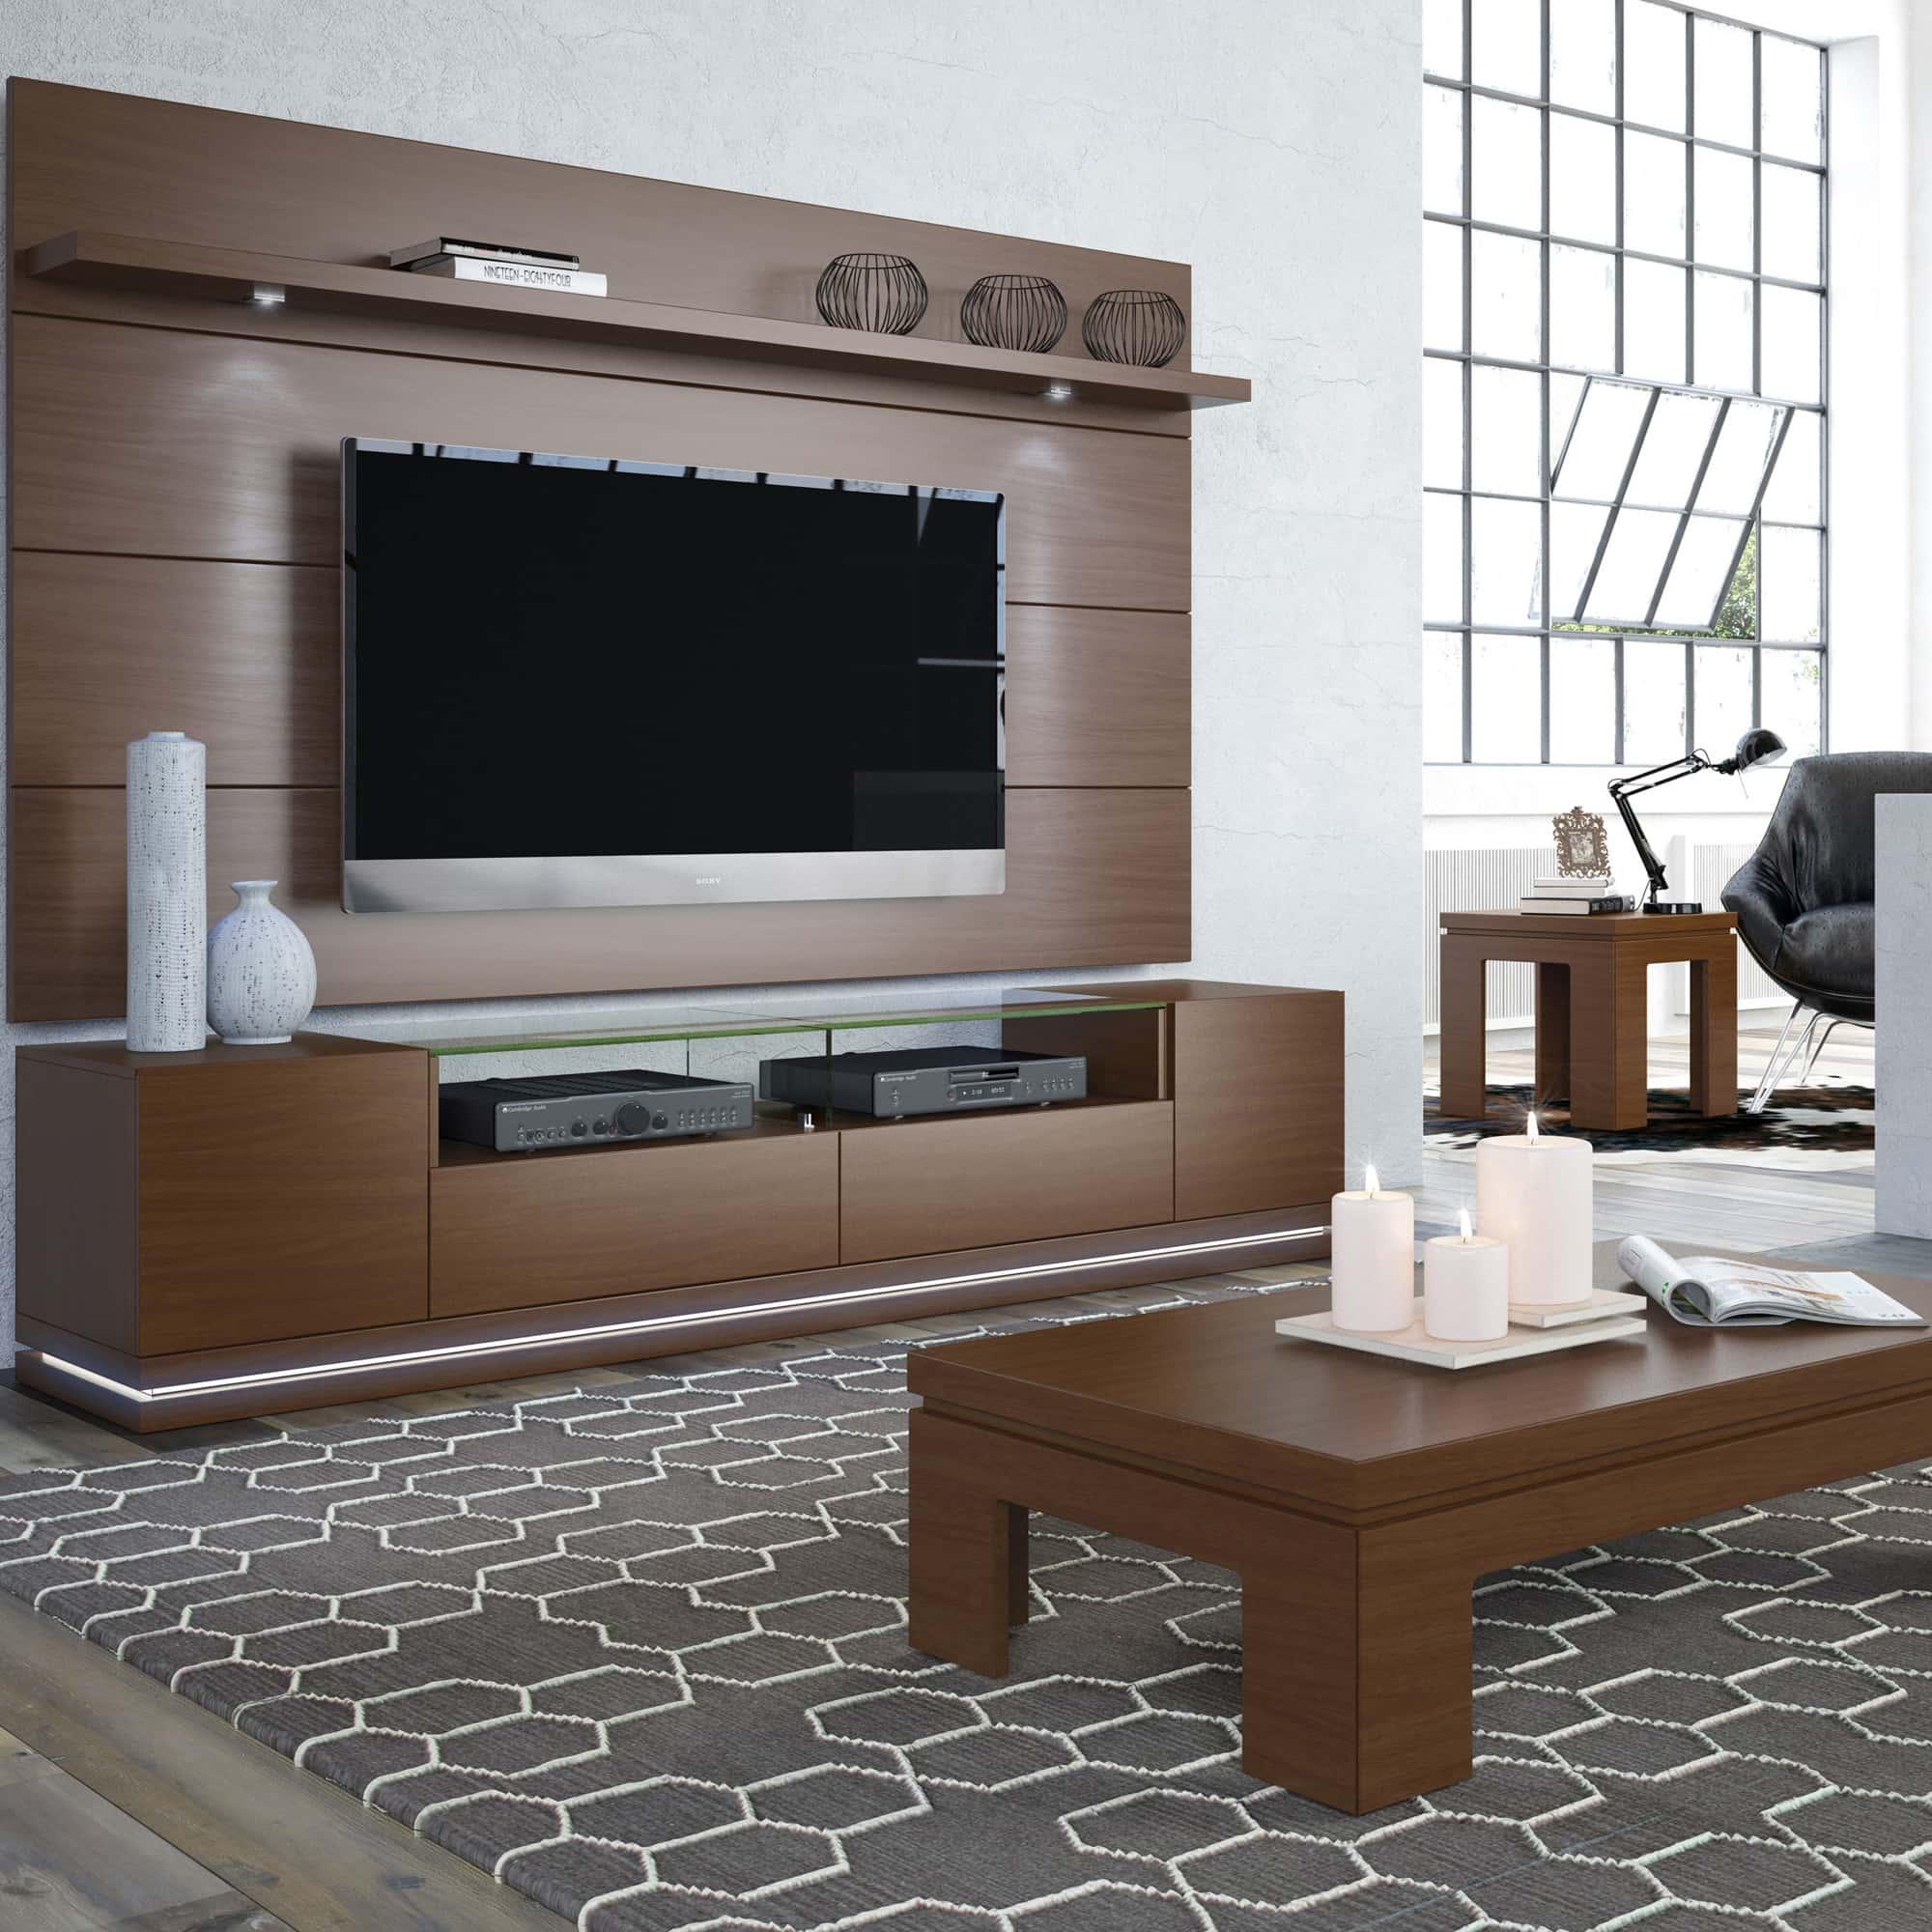 Vanderbilt Nut Brown TV Stand U0026 Cabrini 2.2 Floating Wall TV Panel W/LED  Lights By Manhattan Comfort